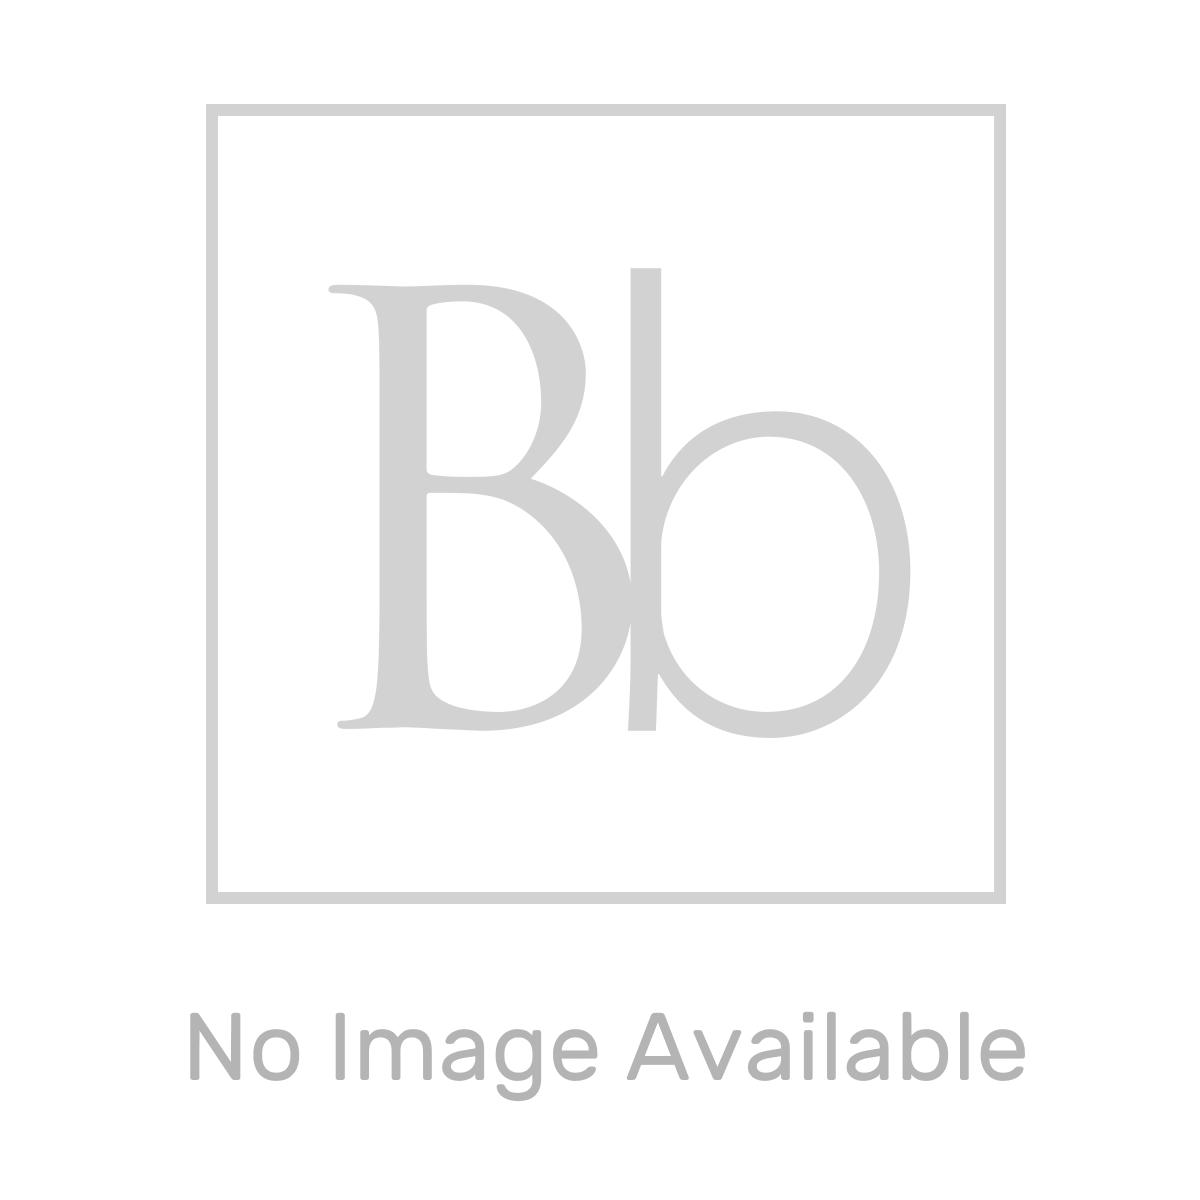 Aquadart Black Slate Shower Tray 1200 x 900